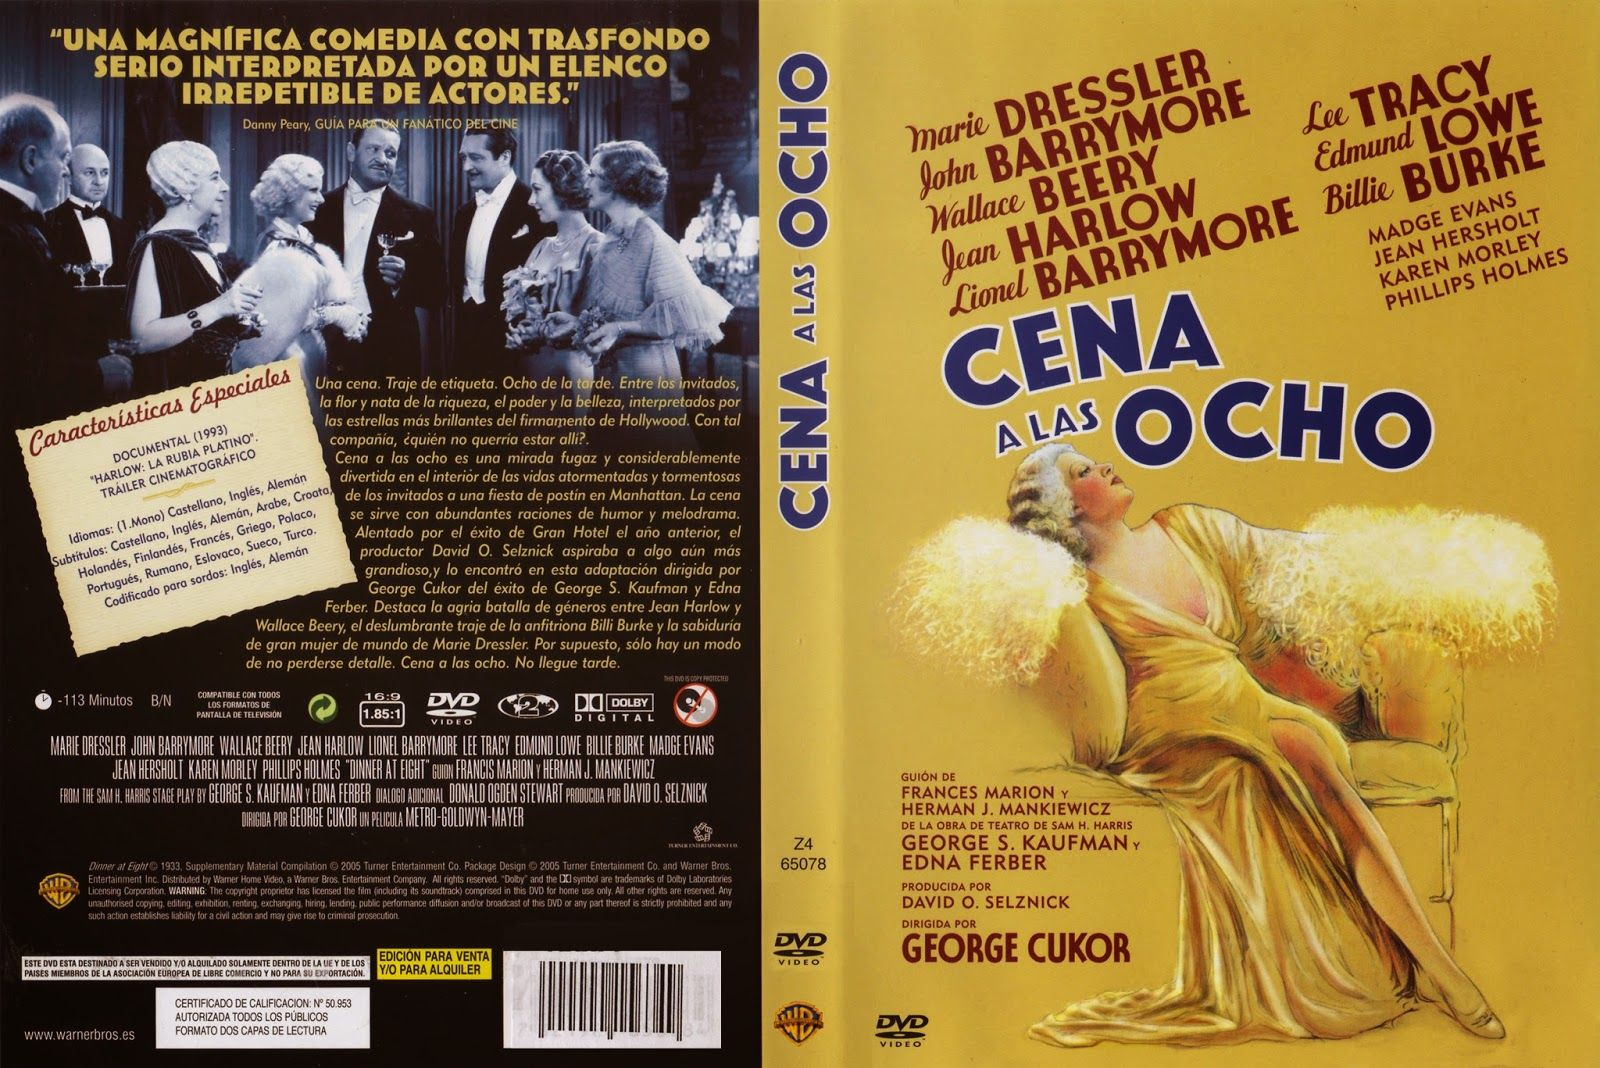 Carátula dvd: Cena a las ocho (1933) (Dinner at Eight)